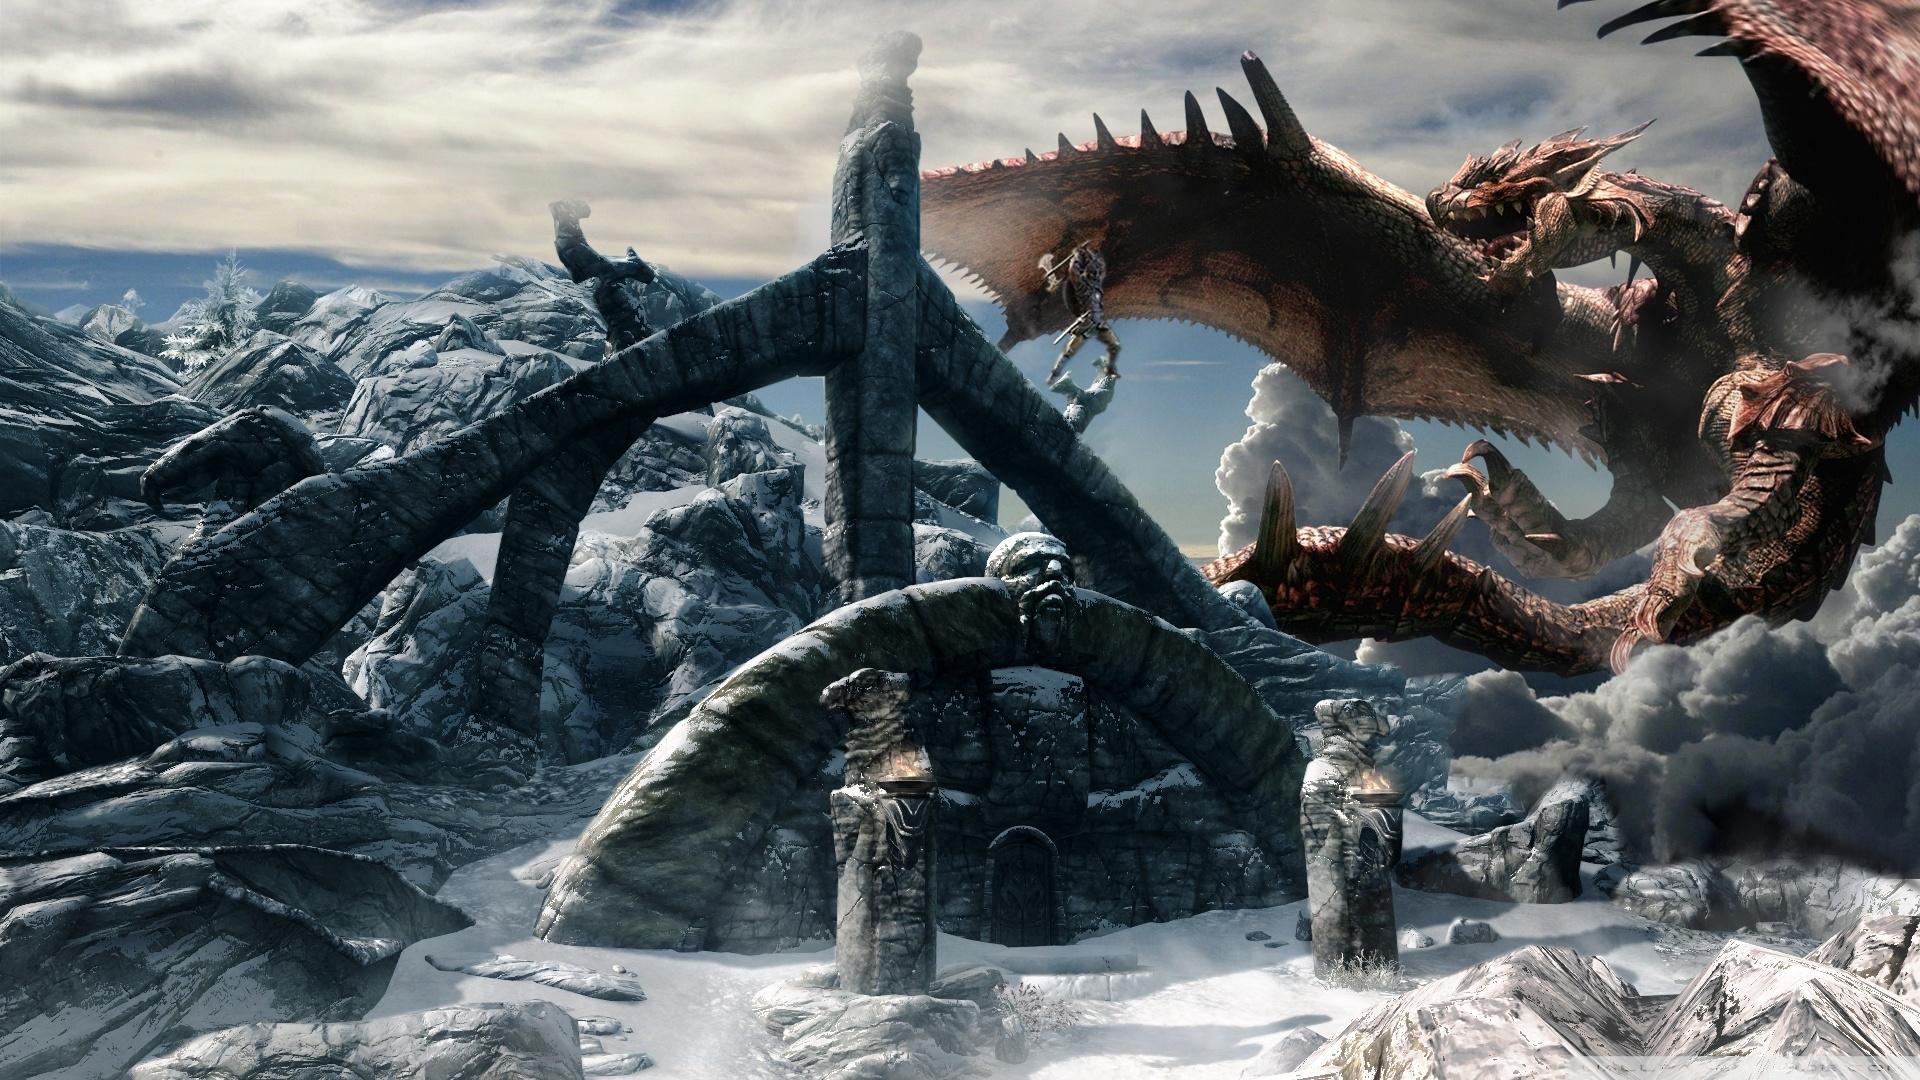 dragon warrior skyrim ❤ 4k hd desktop wallpaper for 4k ultra hd